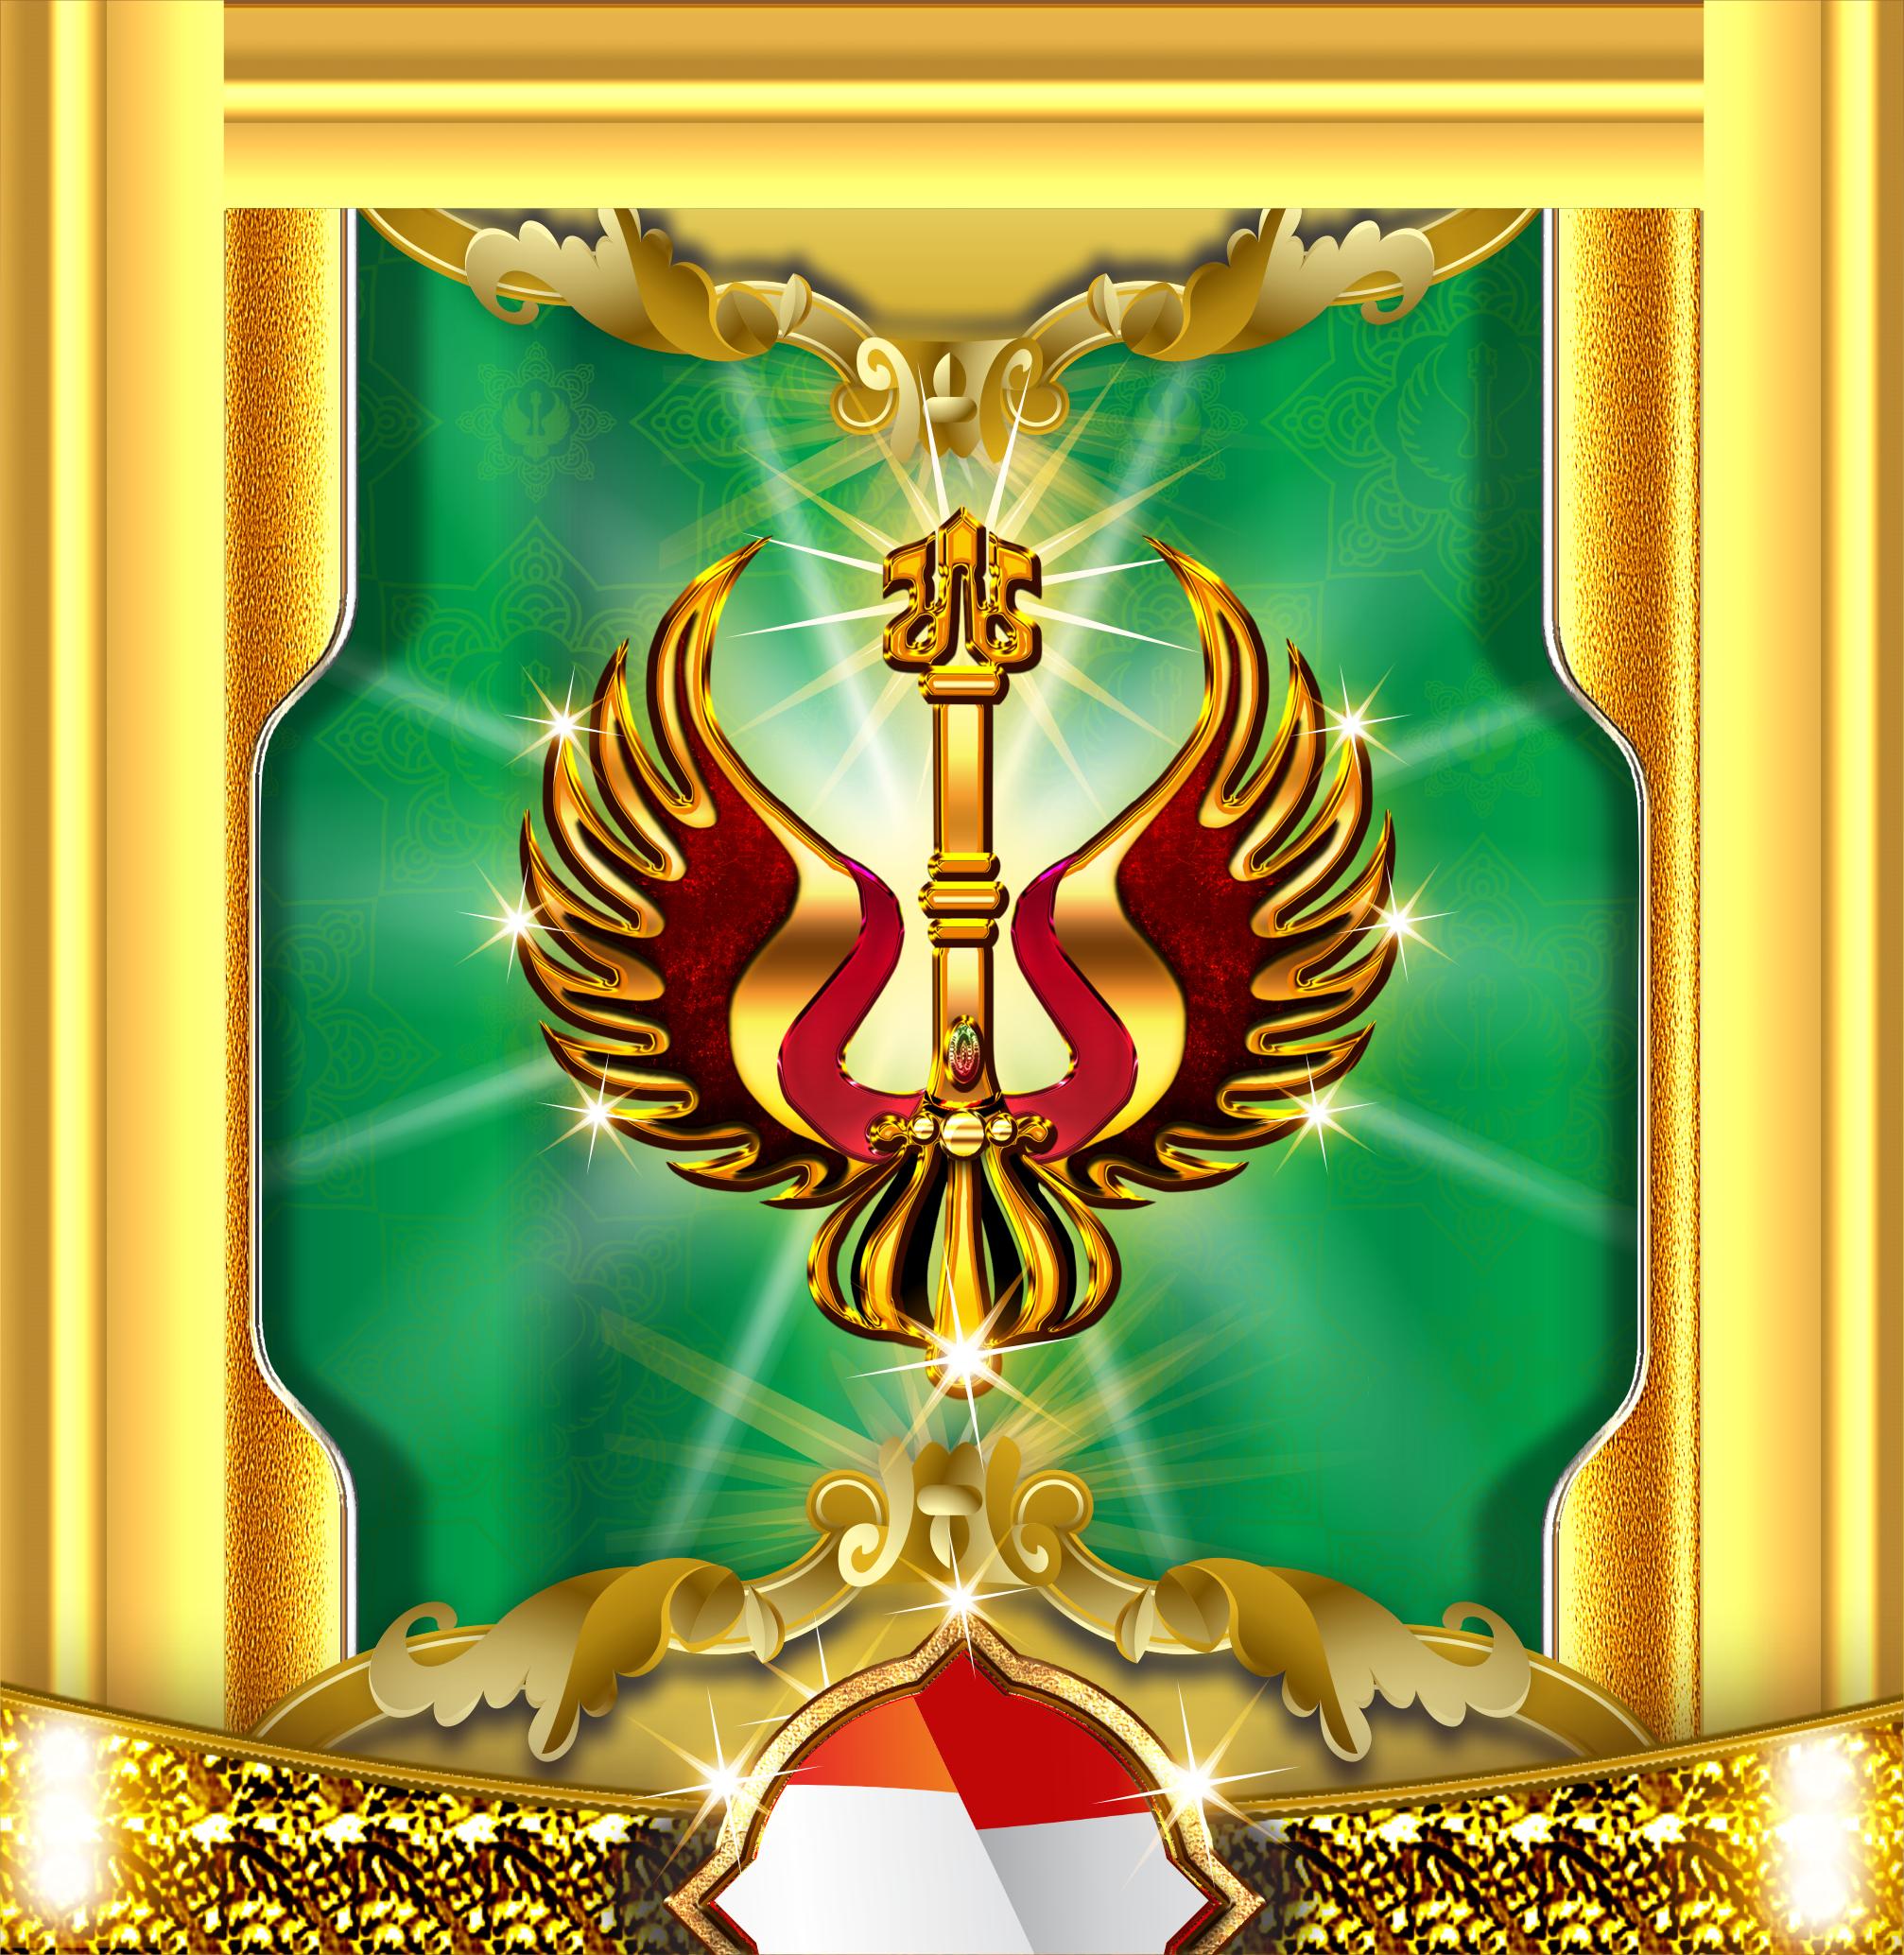 Yaskum Indonesia Rasi Yaskum Yaskumindonesia Rasi Kembangan Bulganon Bulganonamir Amfile Andimiswar Indonesia